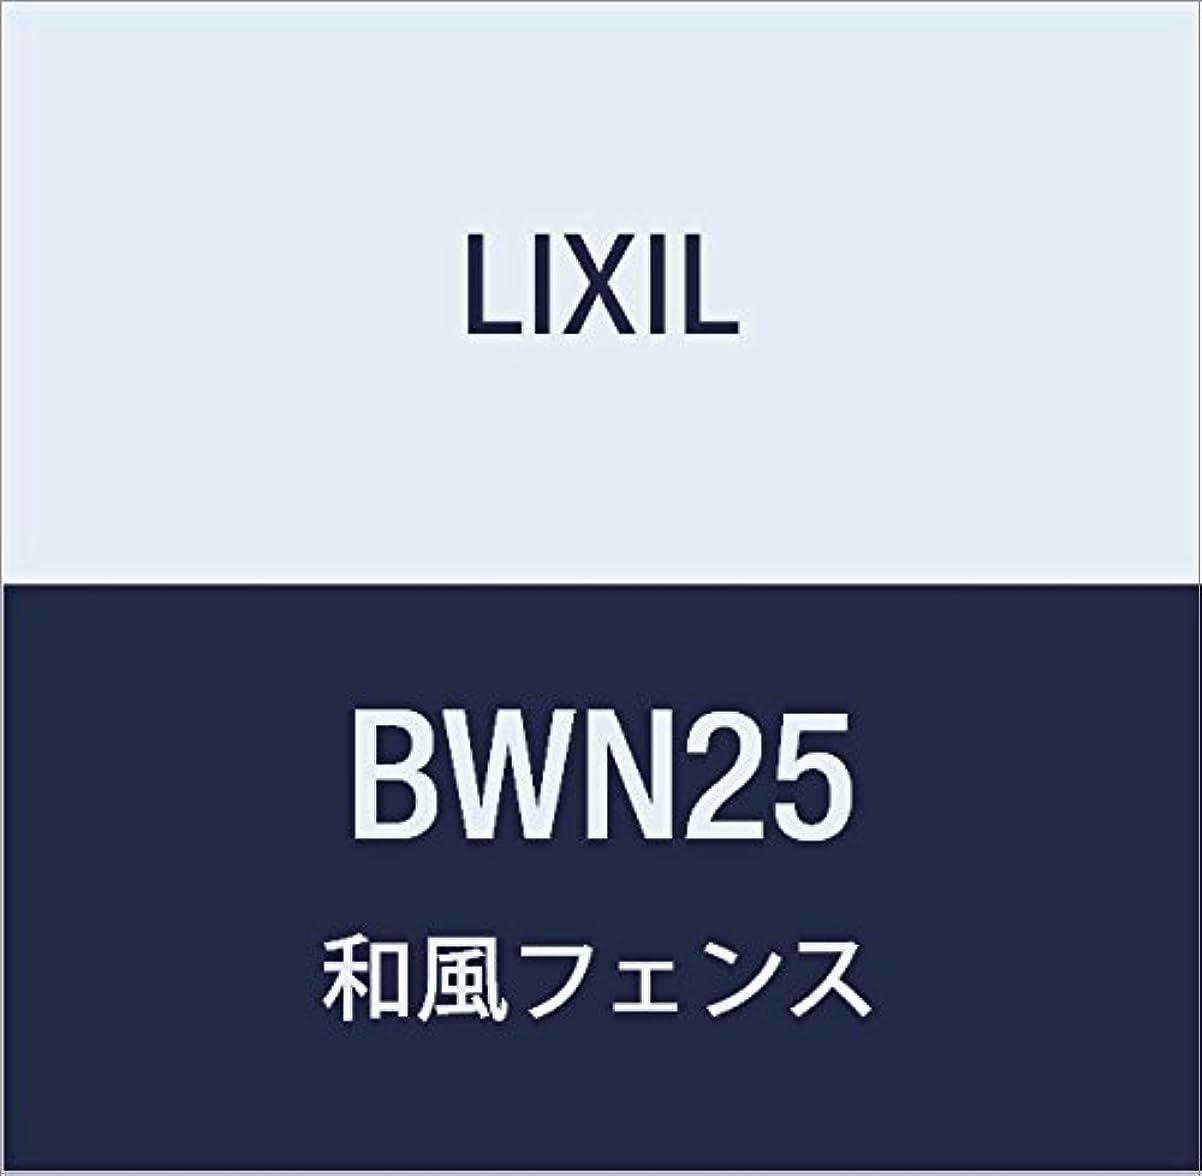 LIXIL(リクシル) TOEX 京香 御簾垣 組立間仕切 角柱T‐18主 木目 BWN25